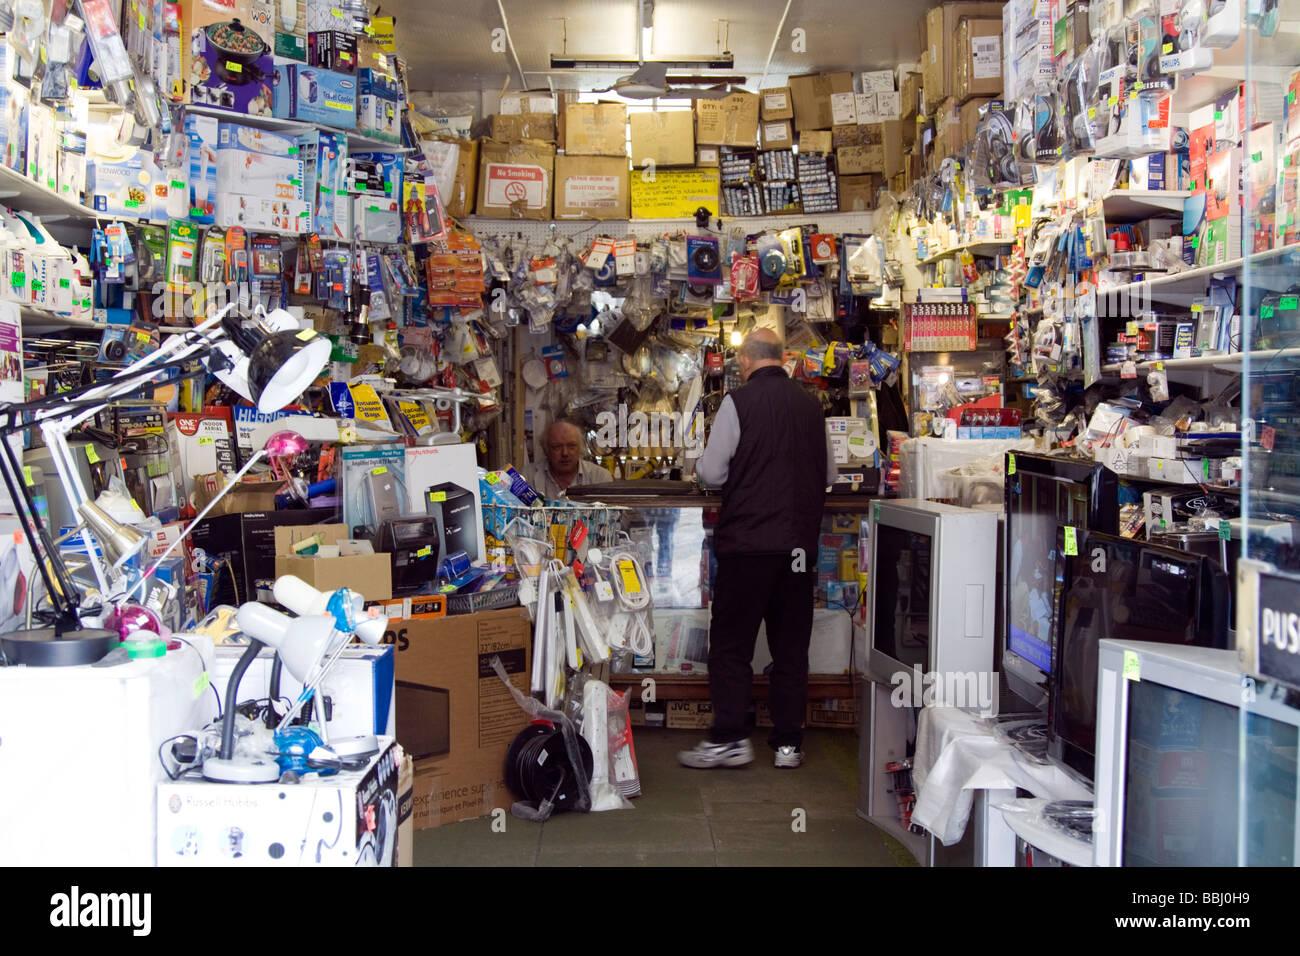 Abba electronics TV repair and home appliances shop, Kentish Town London Stock Photo